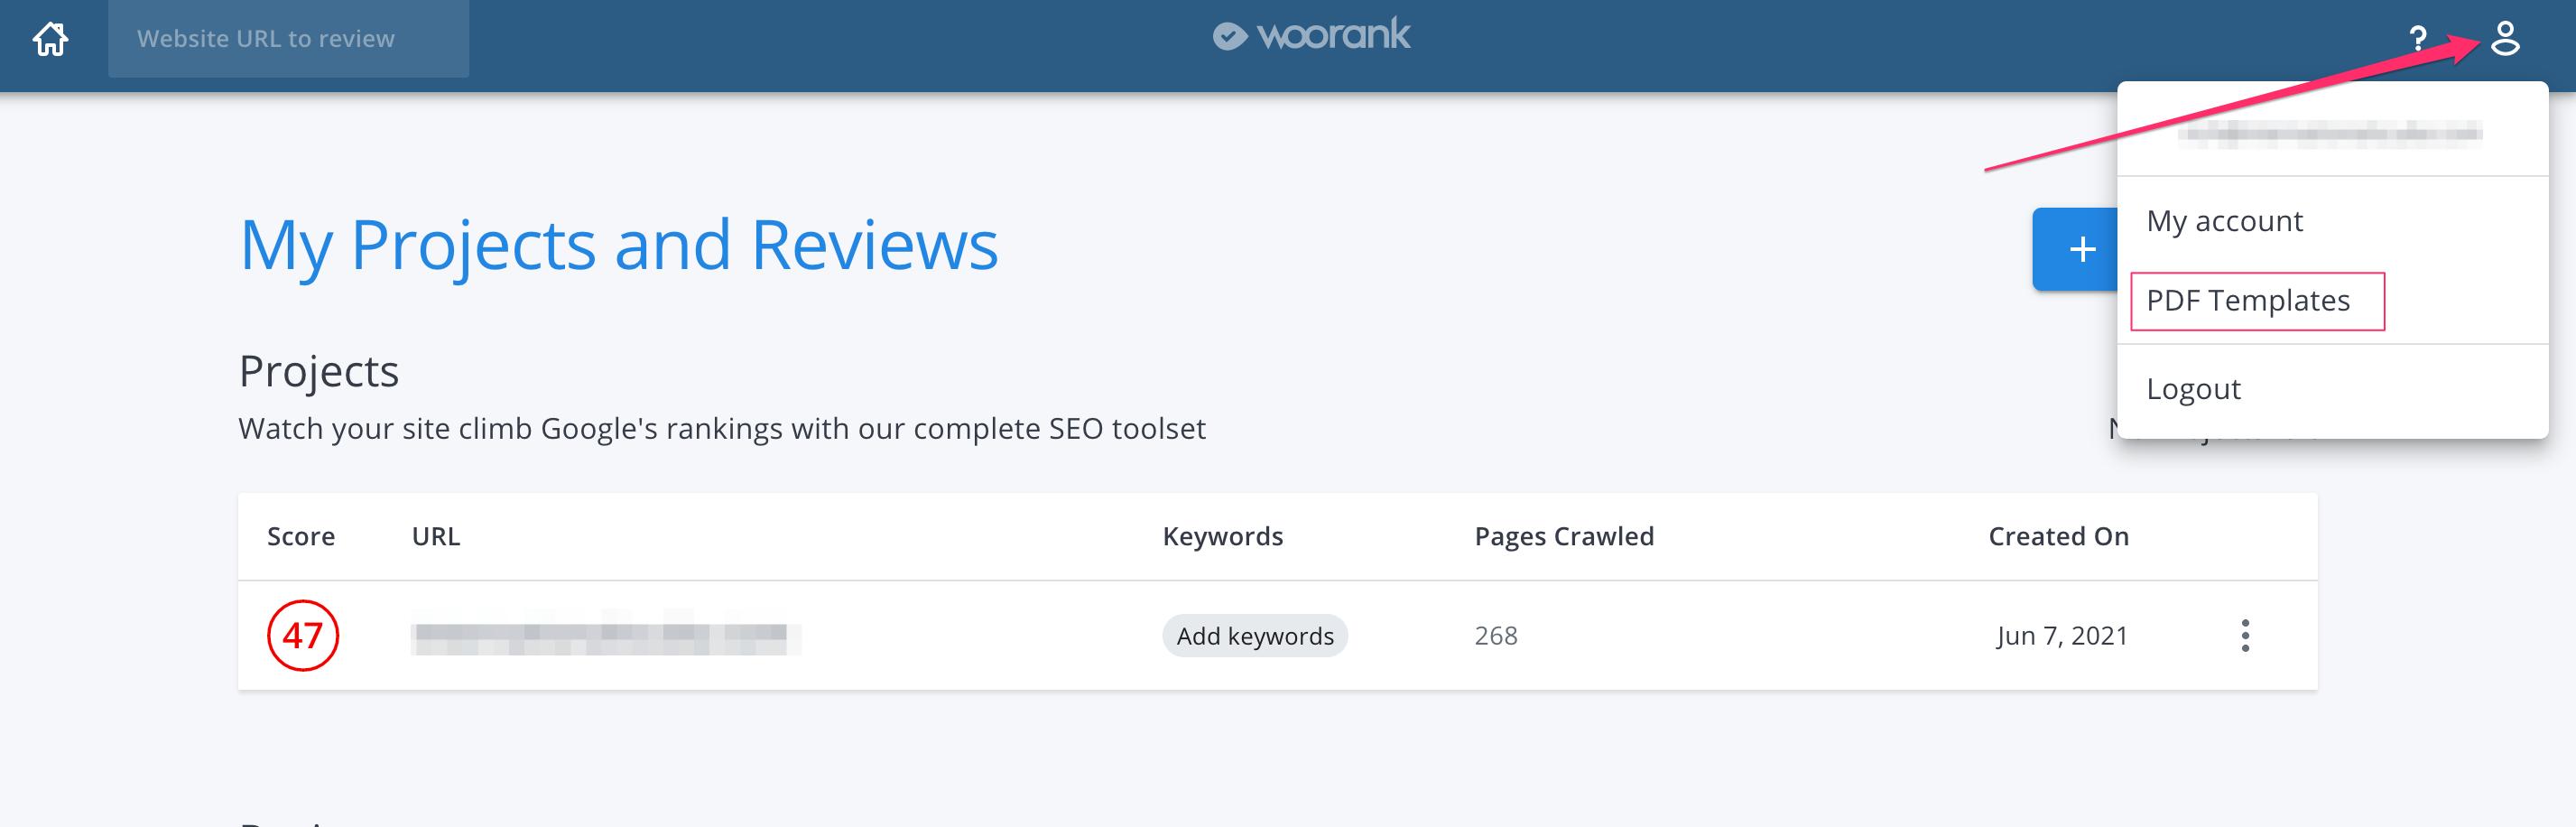 WooRank dashboard to access PDF Templates